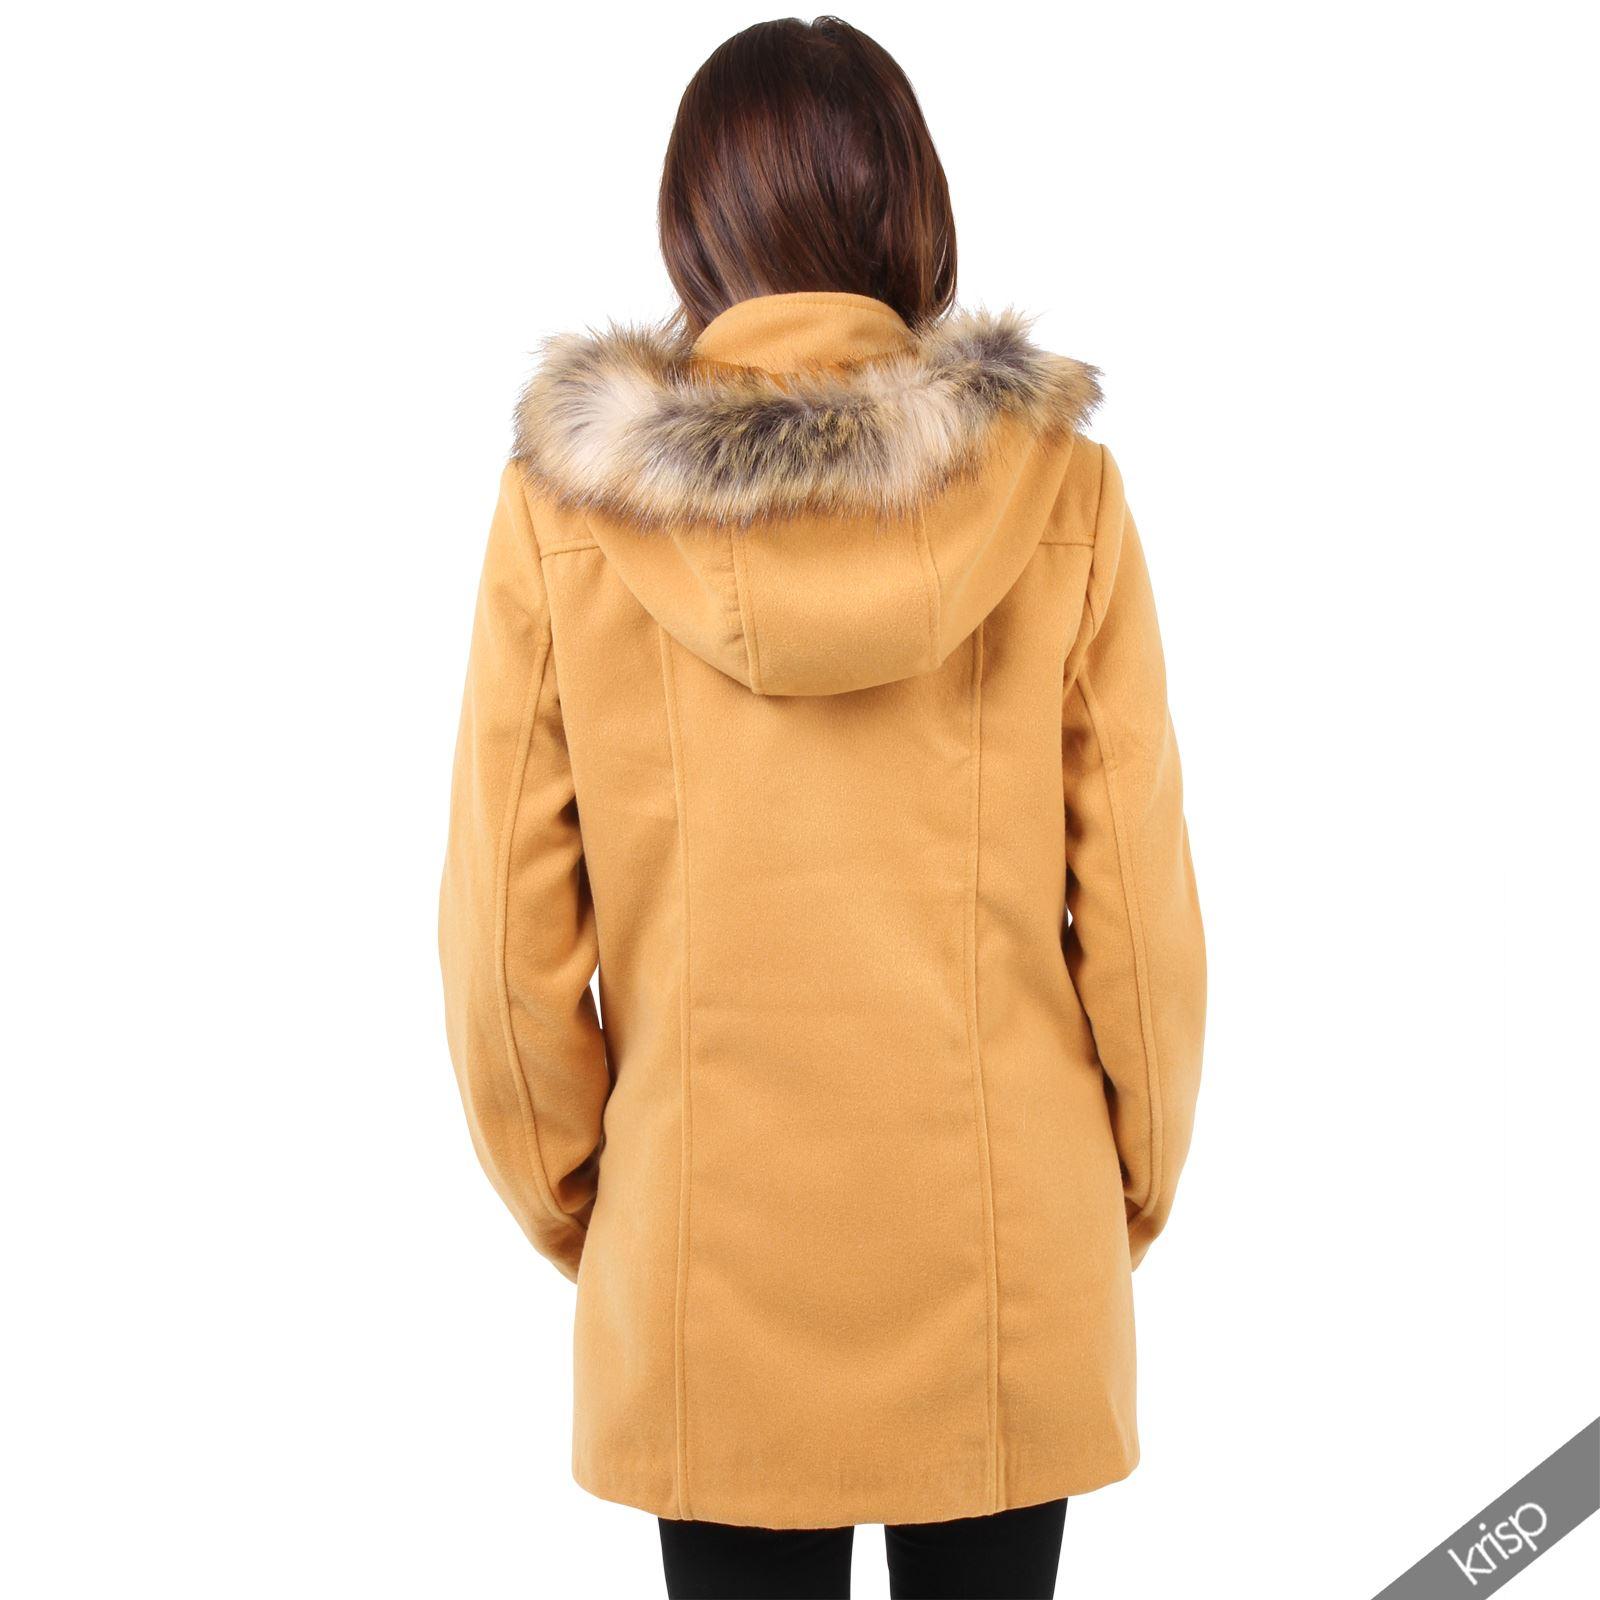 damen jacke kurzer mantel abnehmbare kapuze fell hoodie wolle bergangsjacke ebay. Black Bedroom Furniture Sets. Home Design Ideas